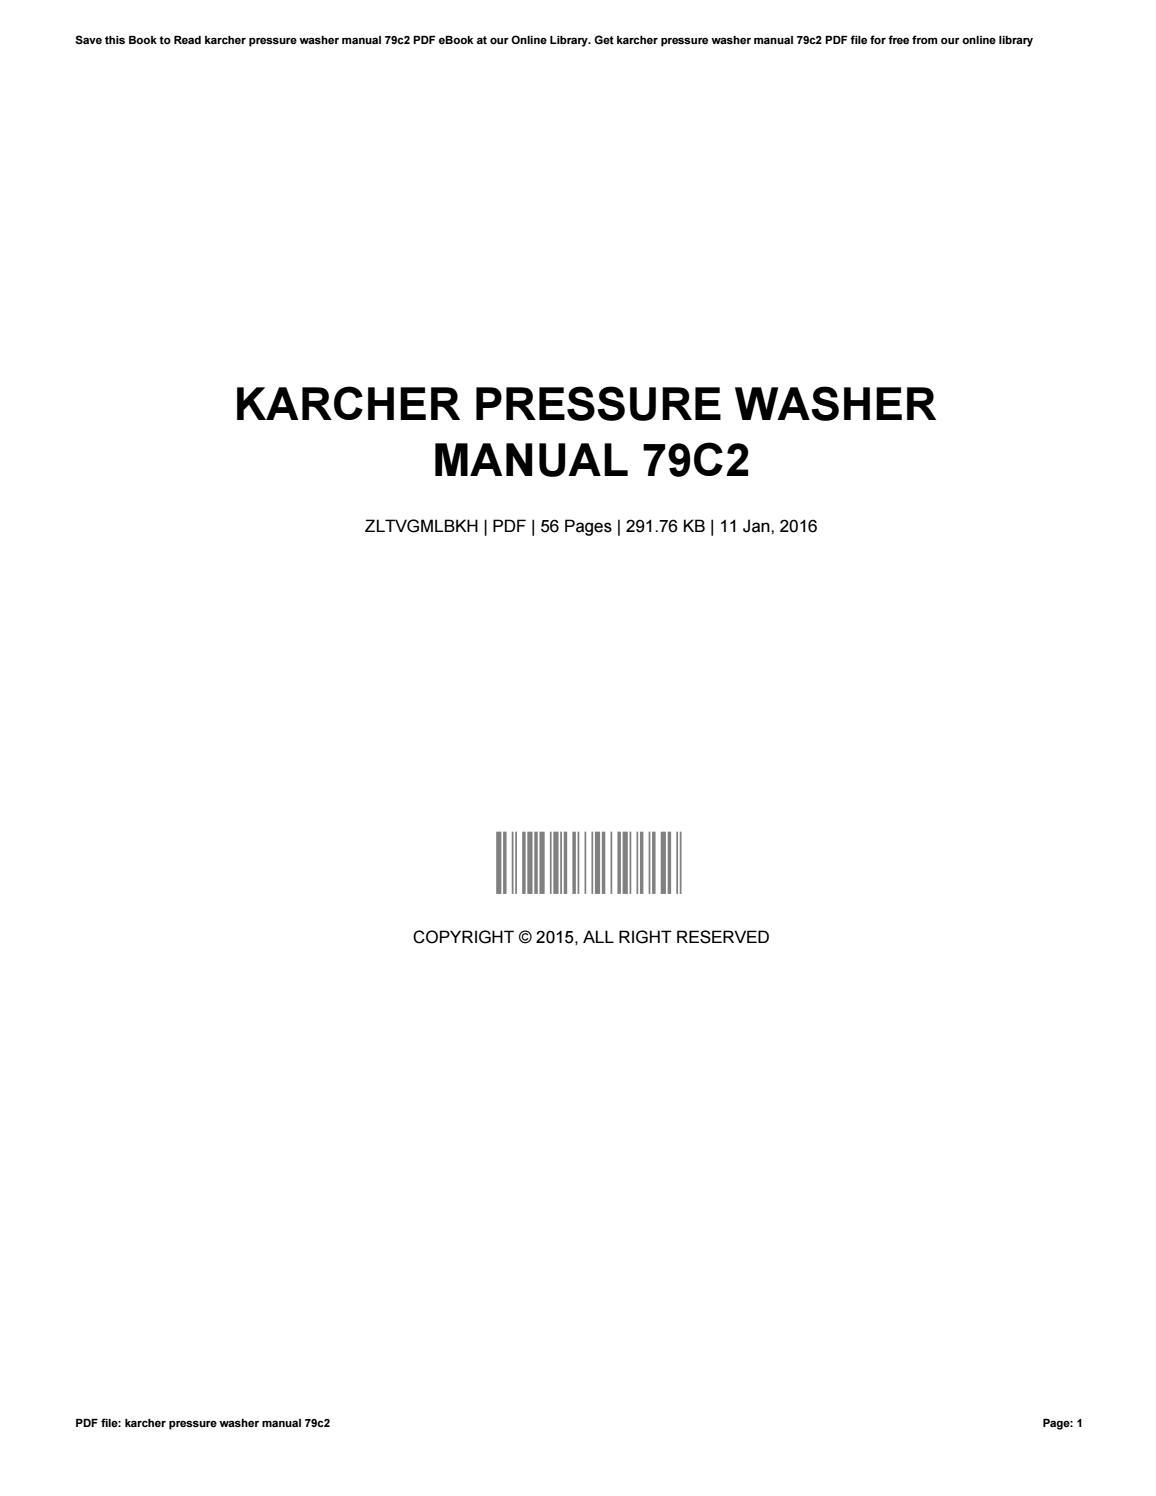 Karcher hds manual ebook ebook mollysme search array karcher instruction manual gallery form 1040 instructions rh topreserve net fandeluxe Gallery